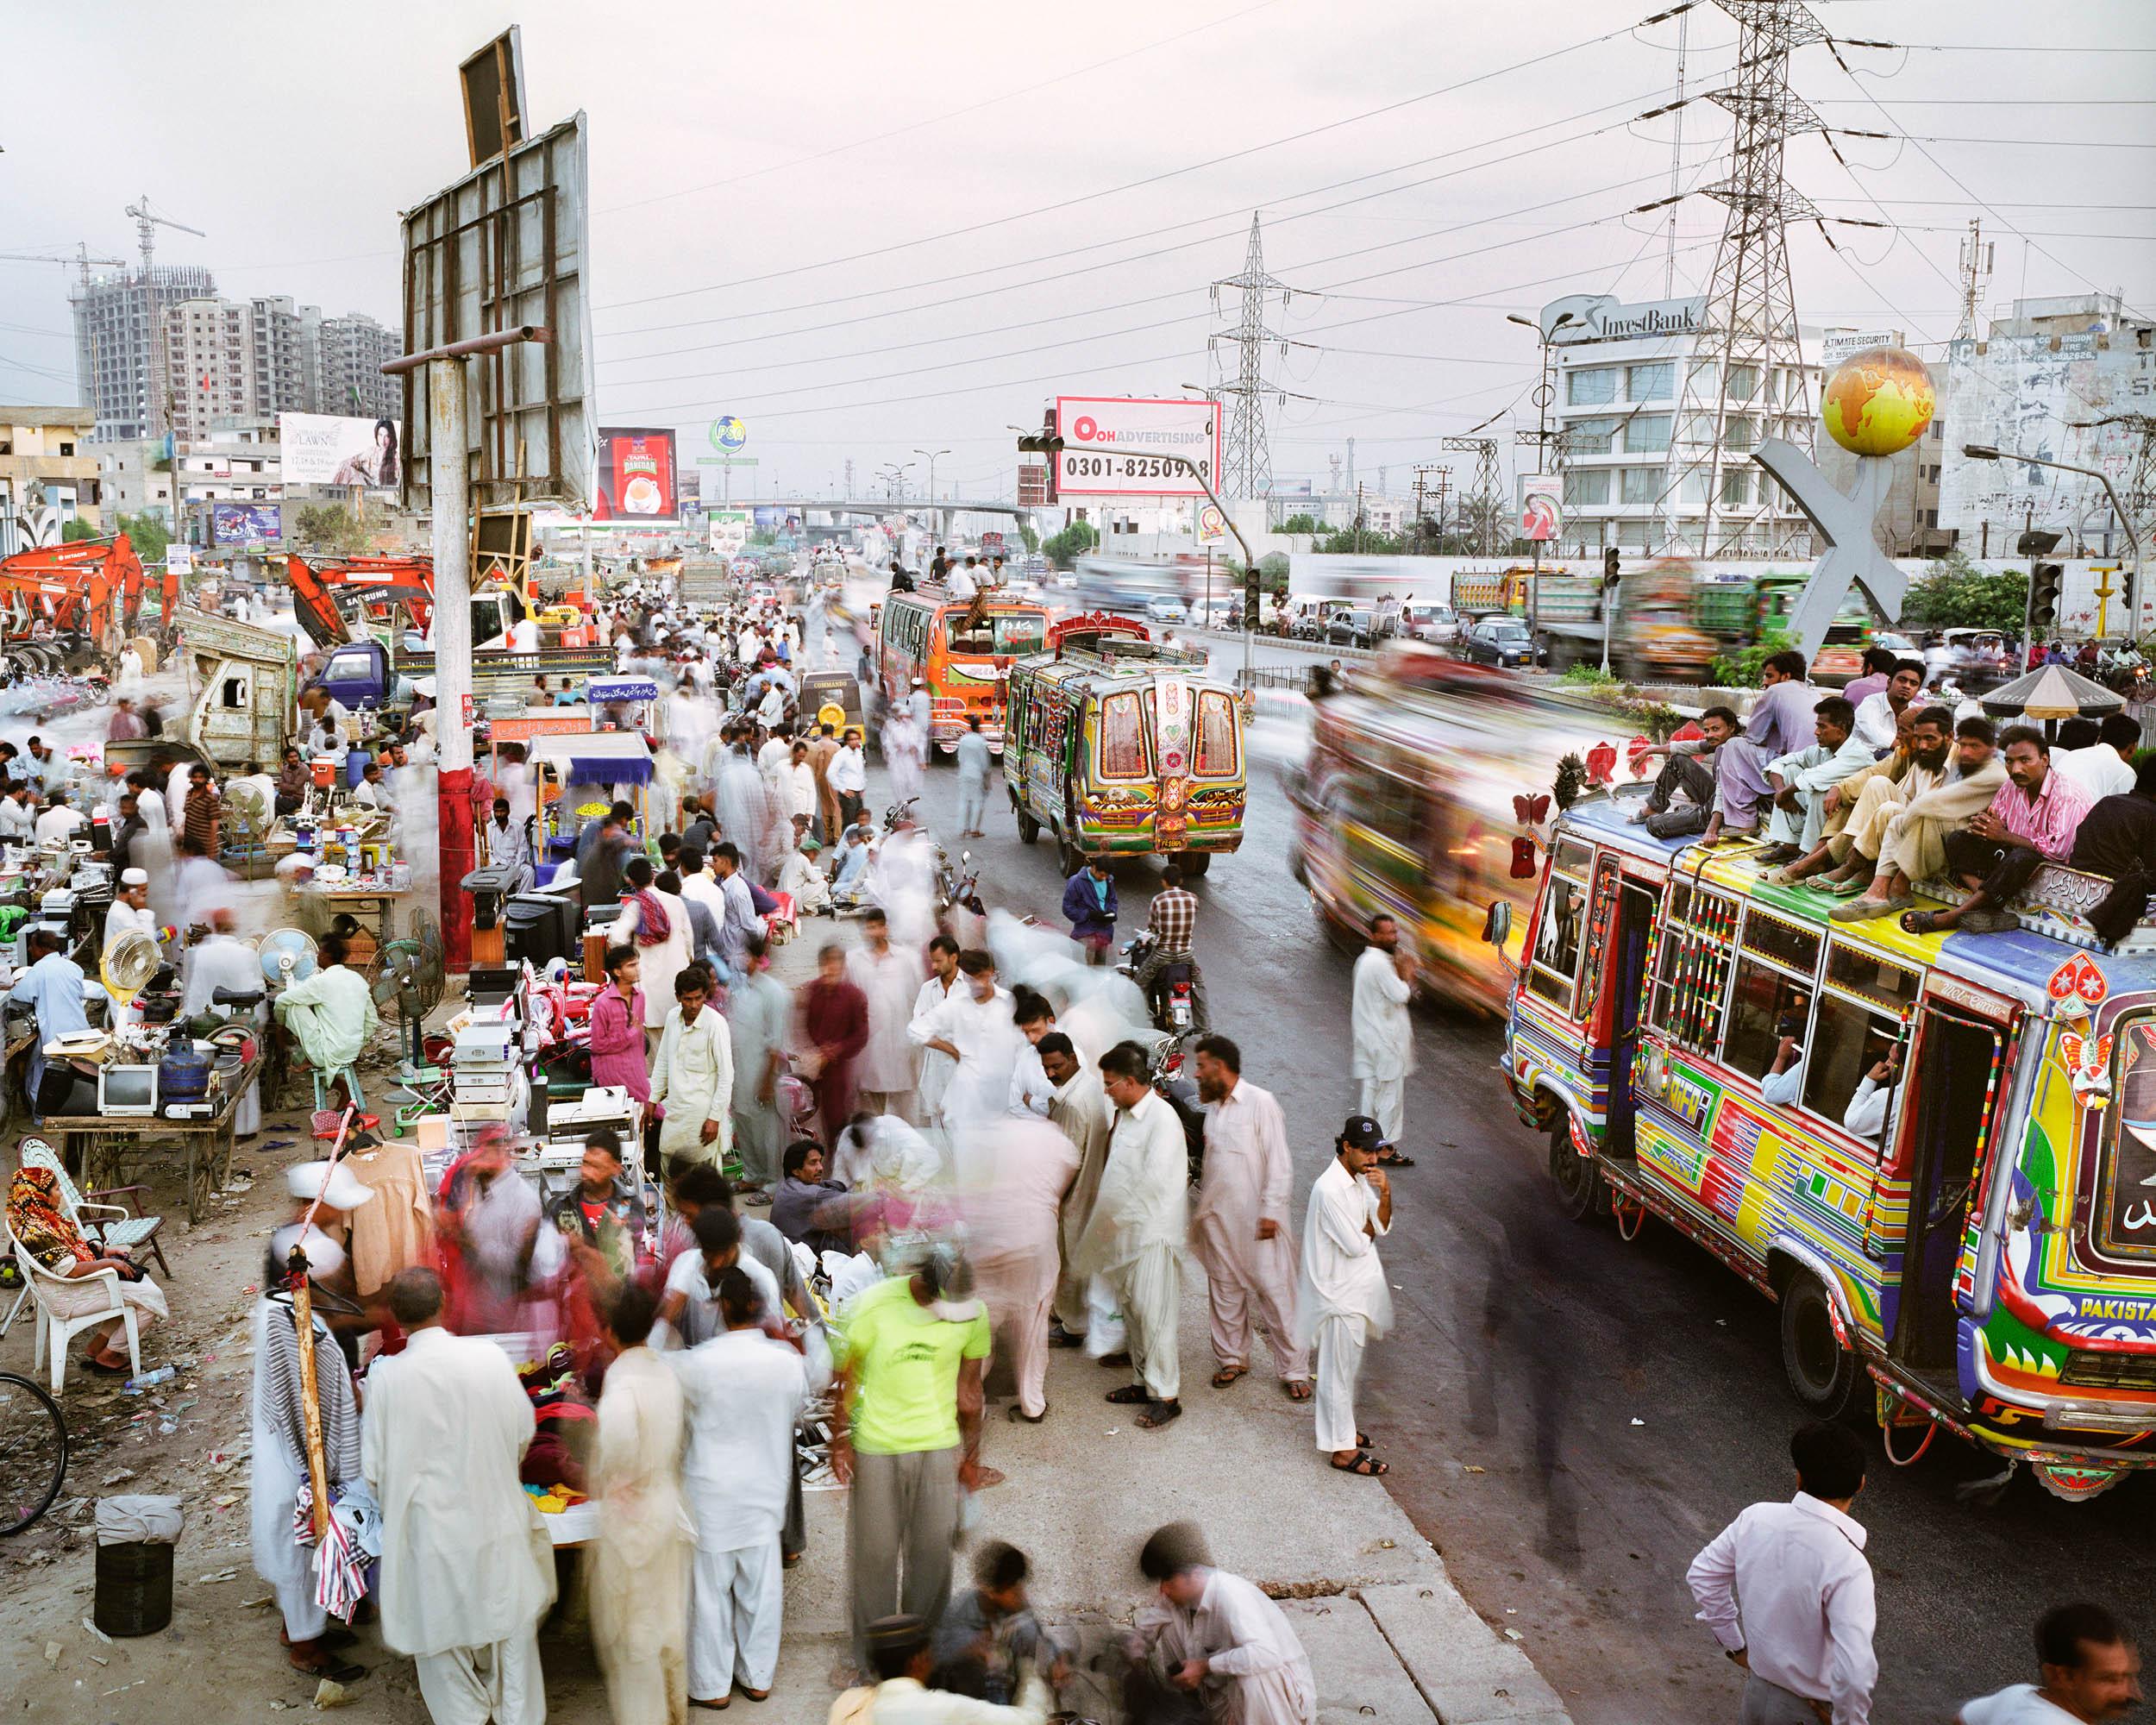 Korangi Road, Defense Housing Authority Phase 2, Karachi, Pakistan